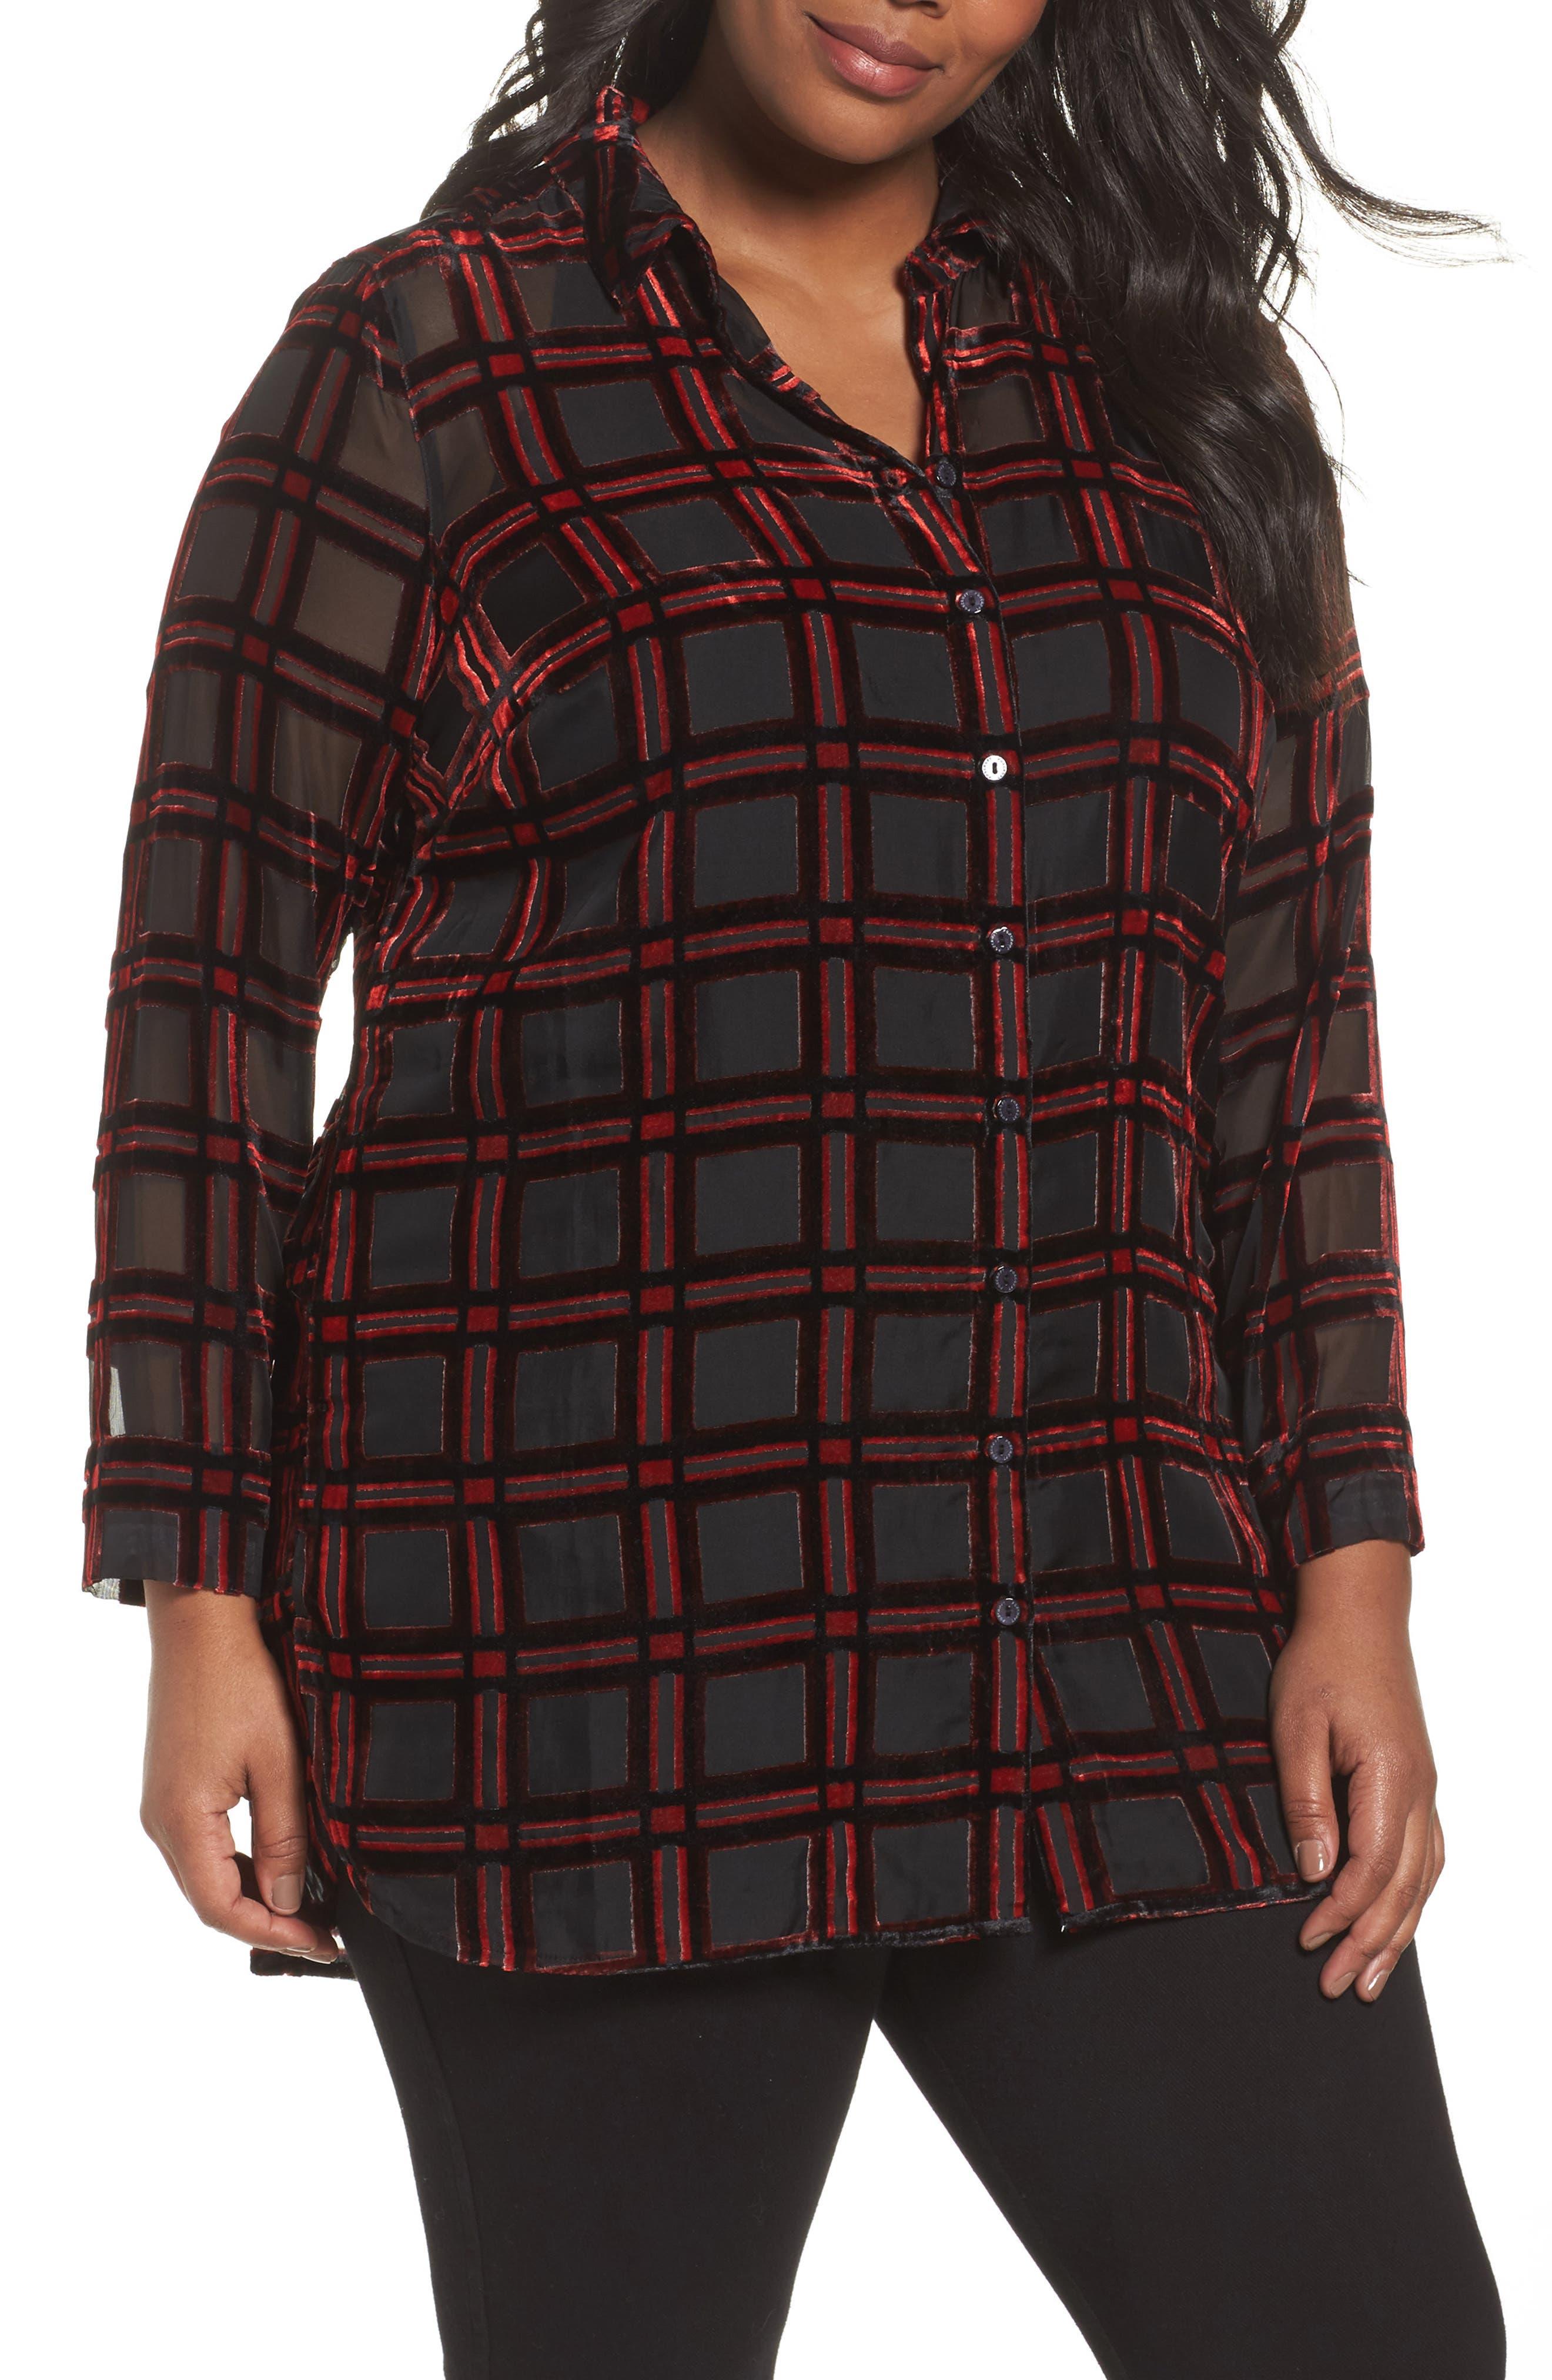 Main Image - Foxcroft Jade Burnout Tartan Shirt (Plus Size)